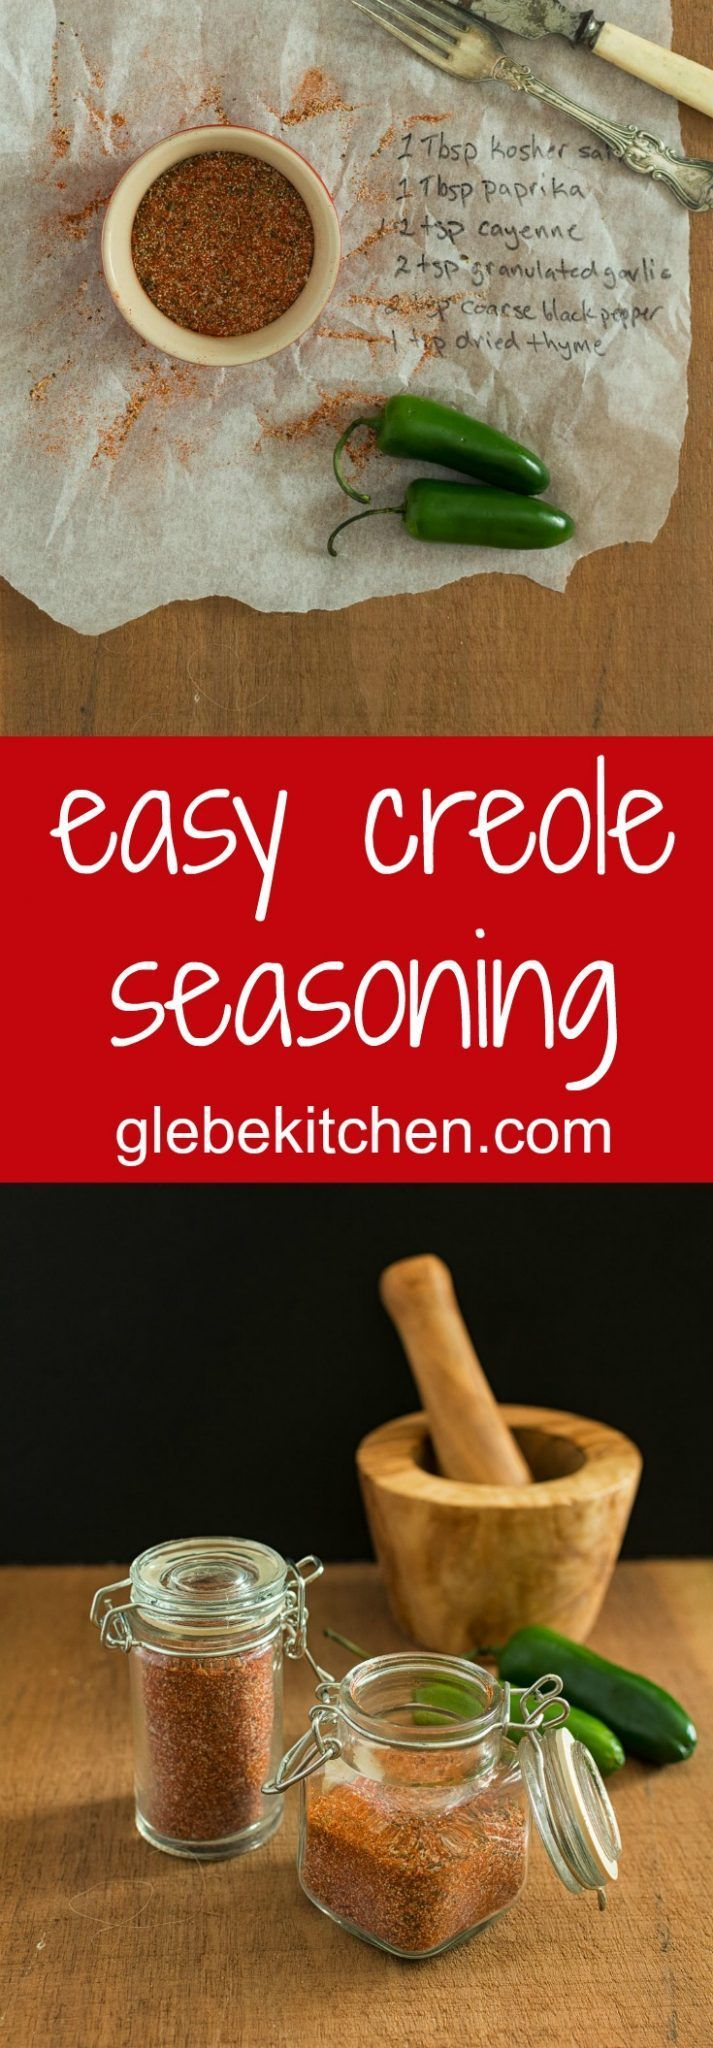 Creole seasoning Recipe Creole seasoning, Food recipes